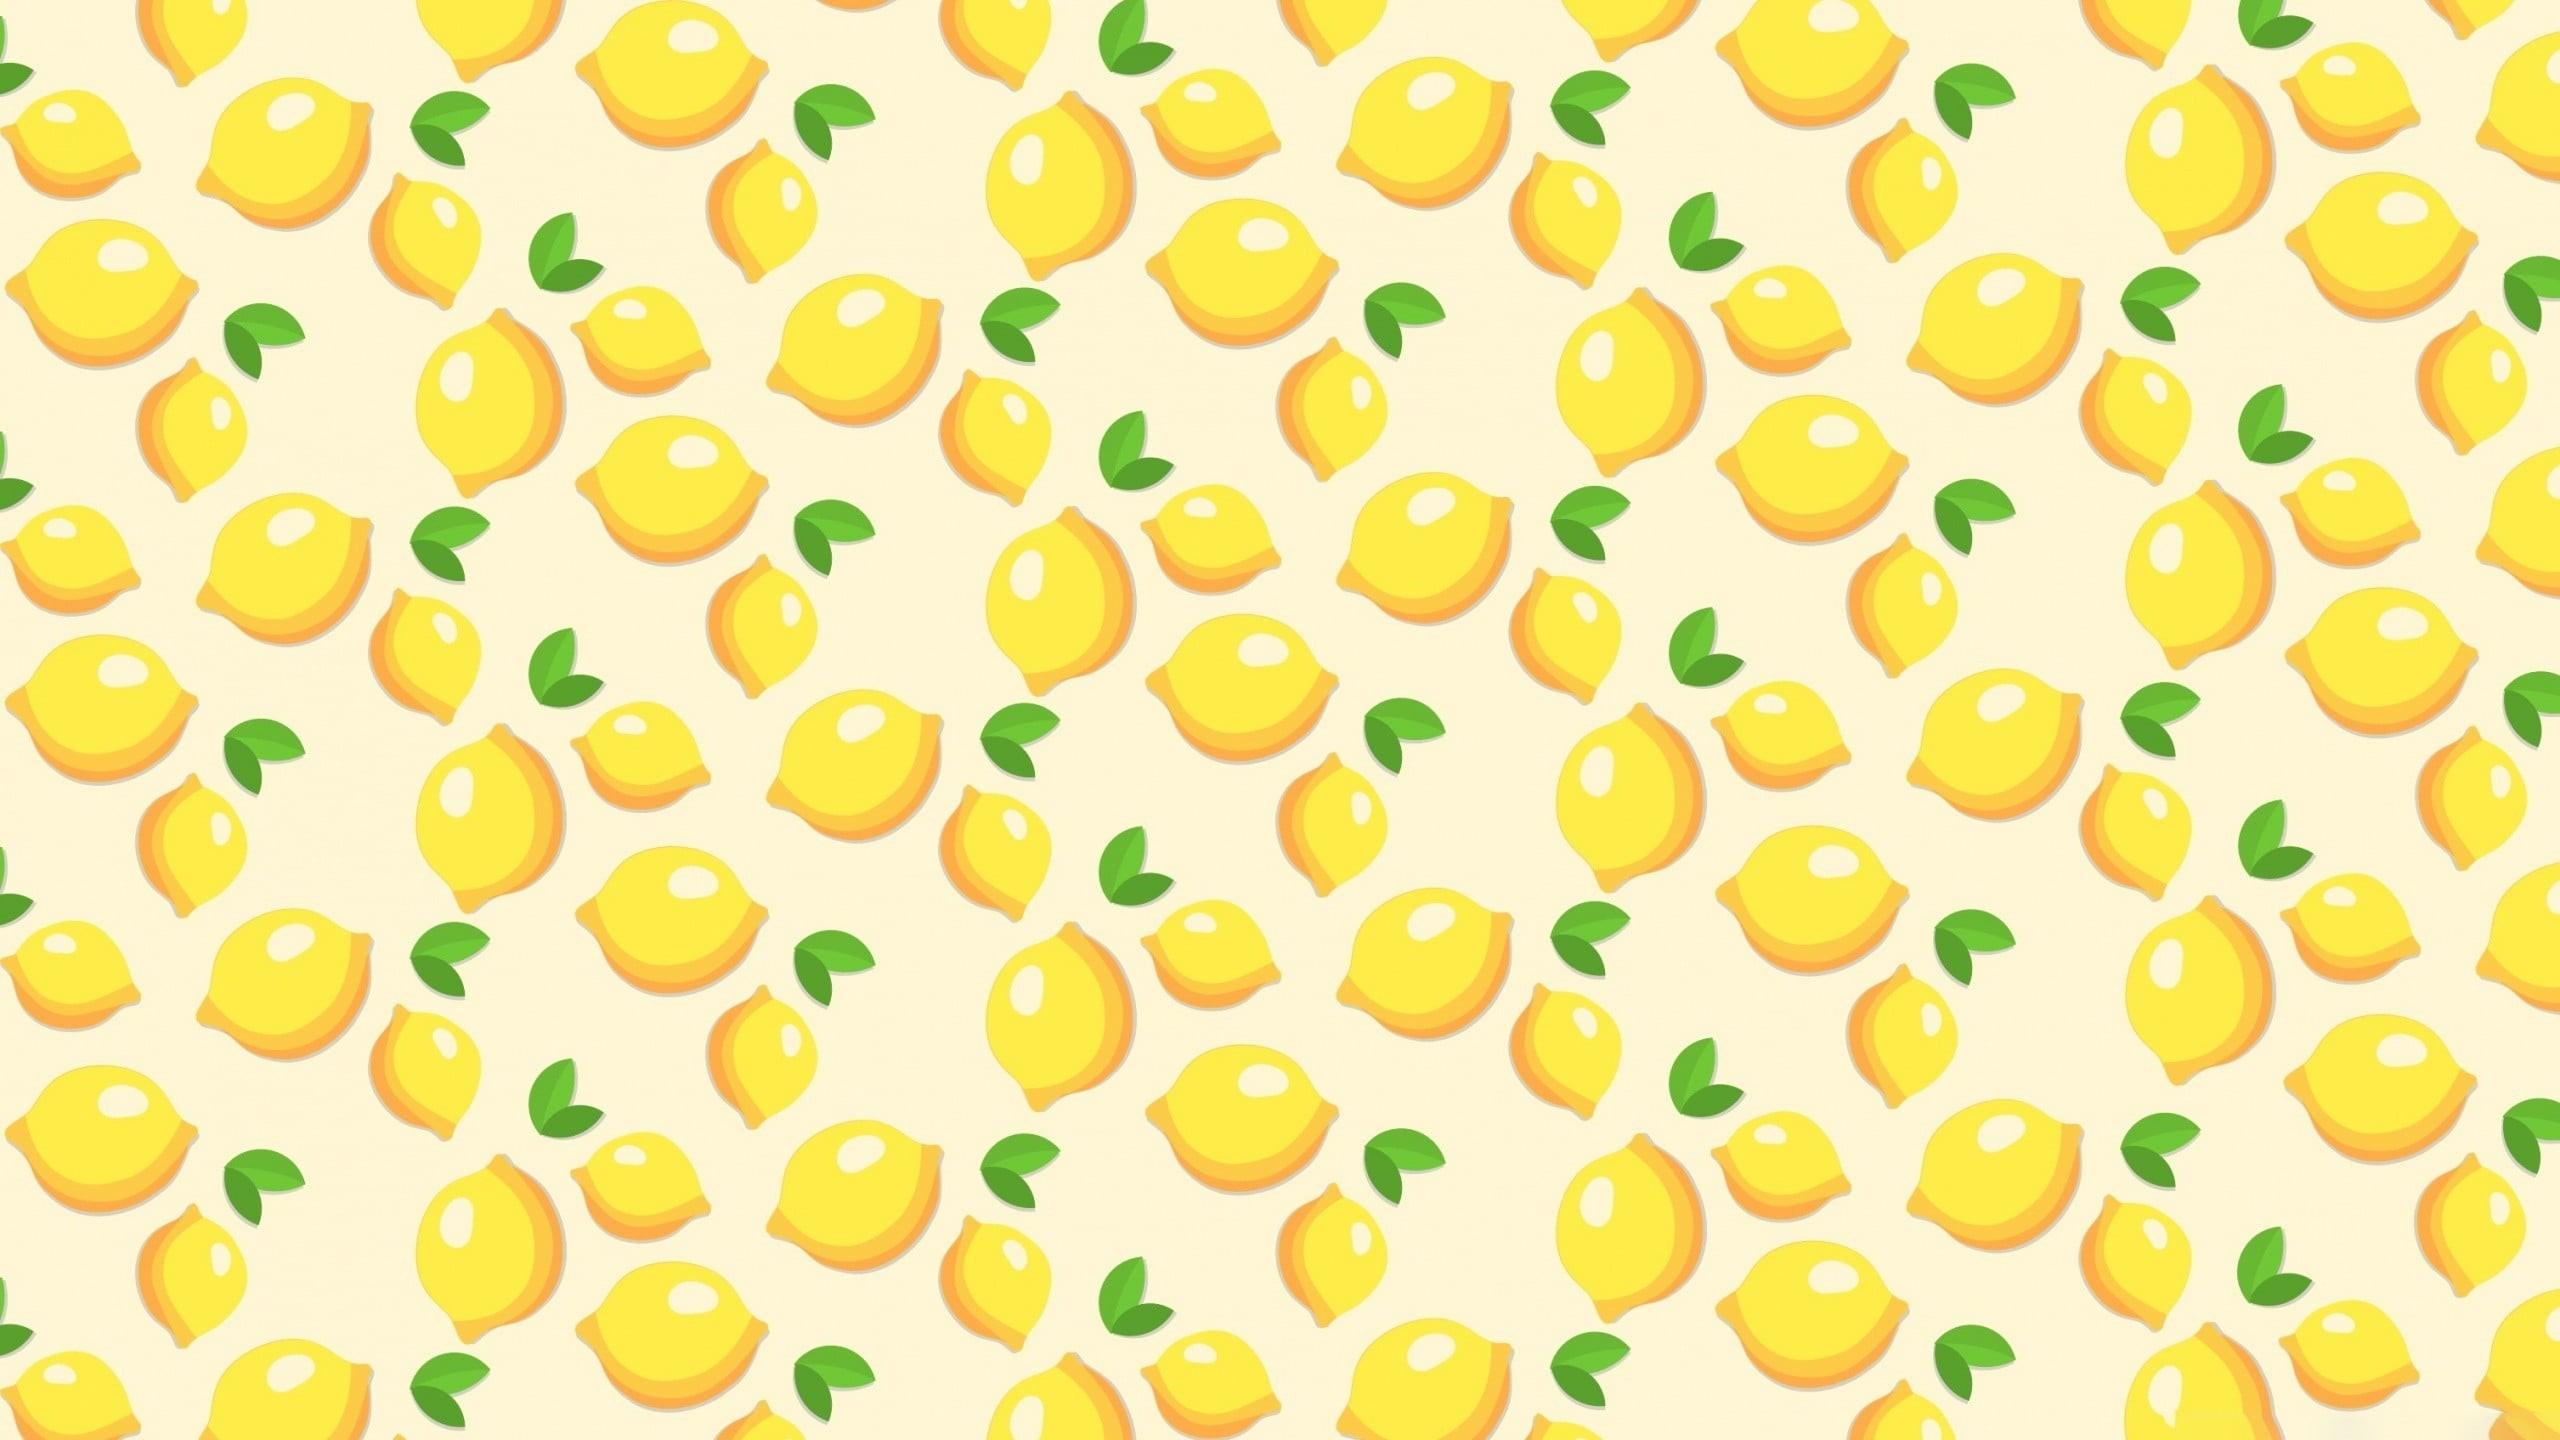 Cute Yellow Desktop wallpaper